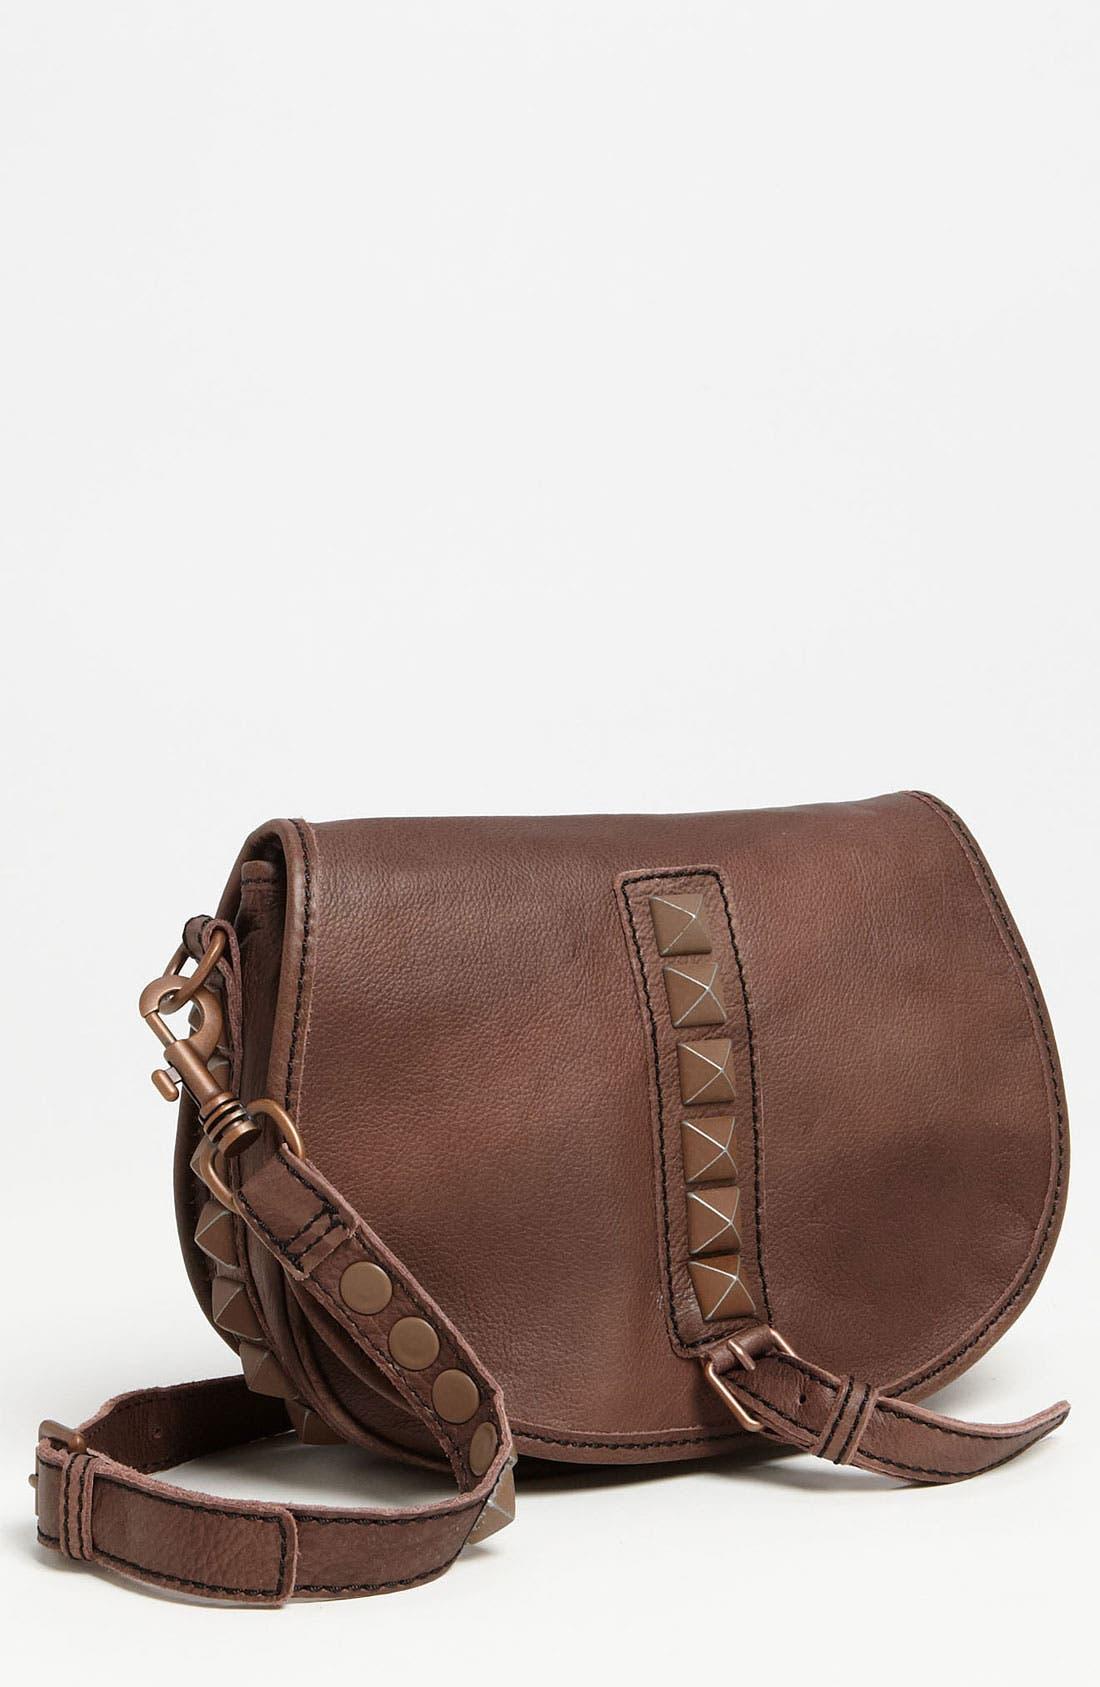 Alternate Image 1 Selected - Liebeskind 'Filipa' Leather Crossbody Bag